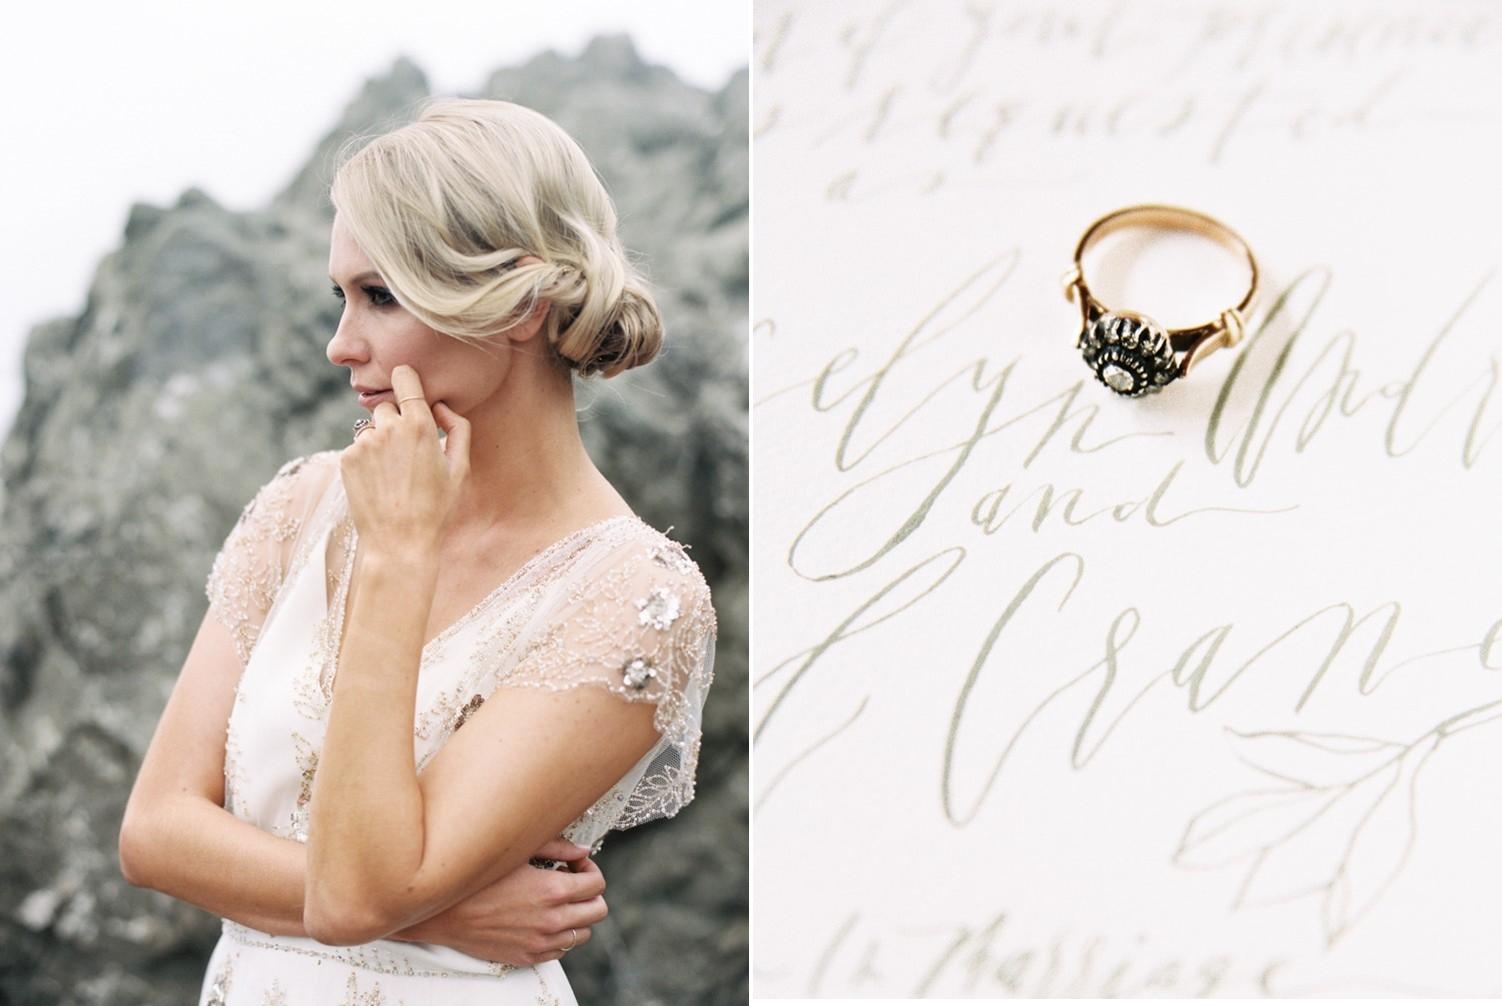 Vintage Engagement Ring // Photography by Taralynn Lawton http://taralynnlawton.com